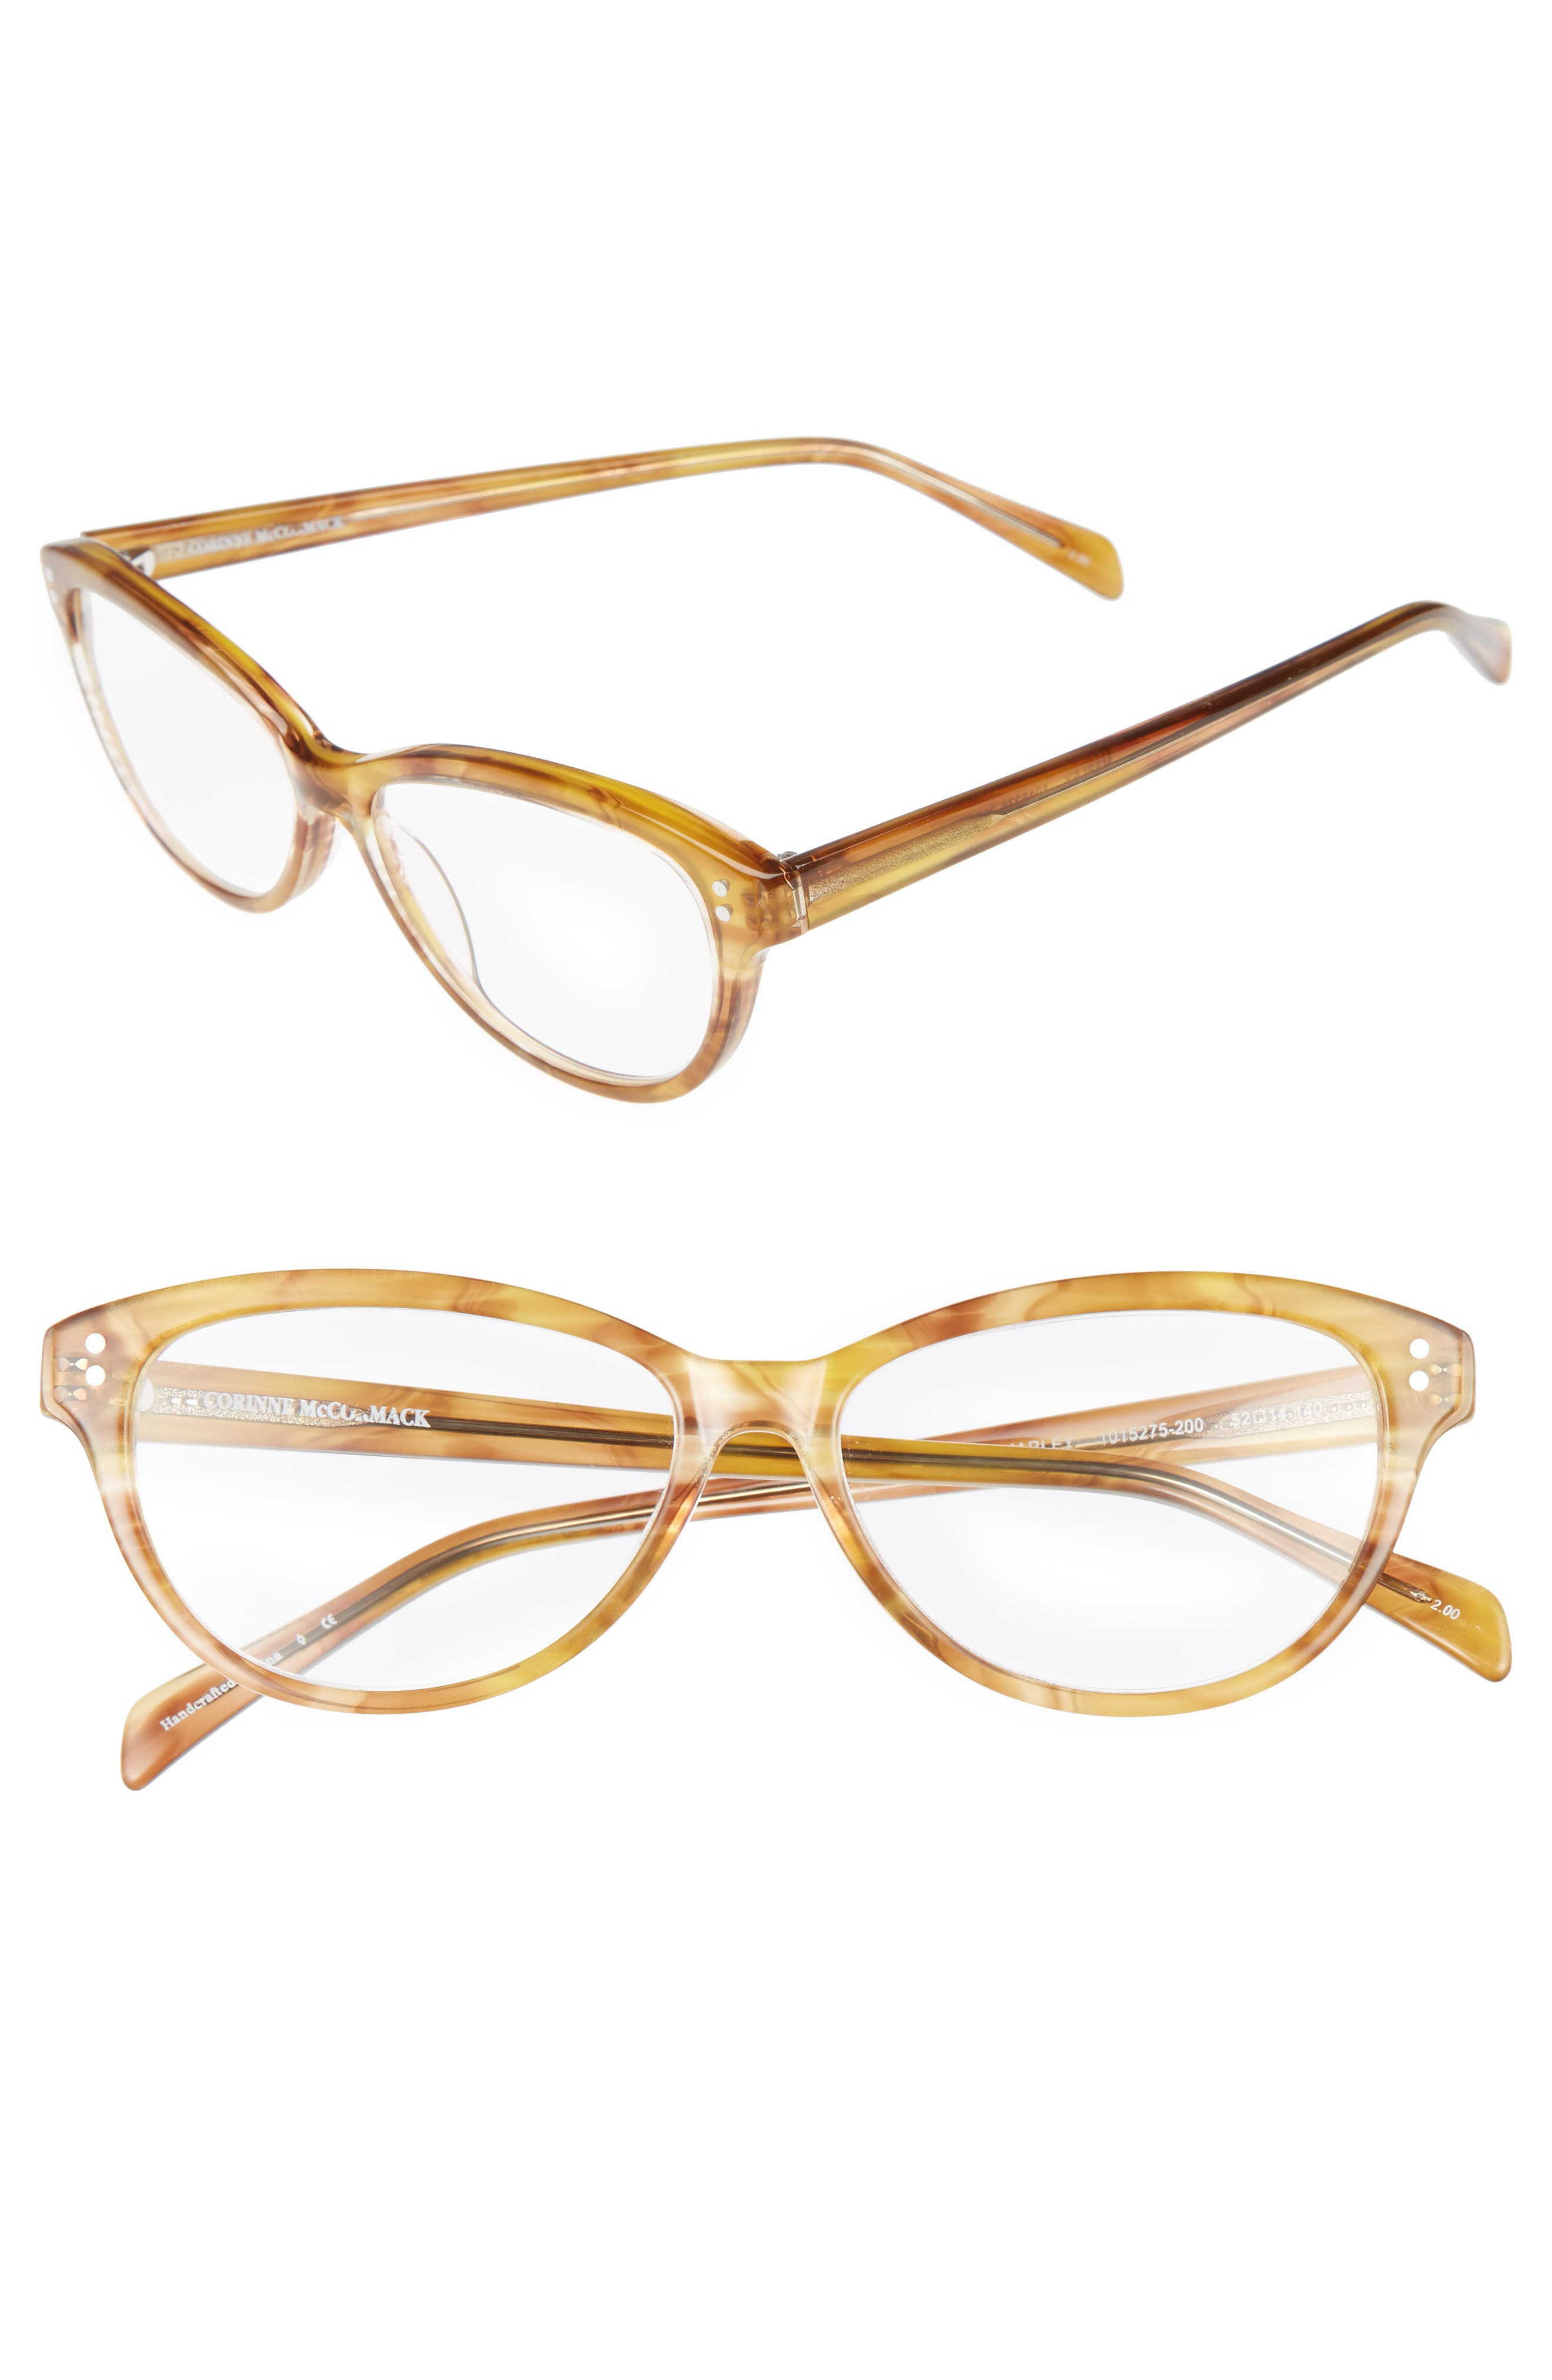 Corinne McCormack Marley 52mm Reading Glasses